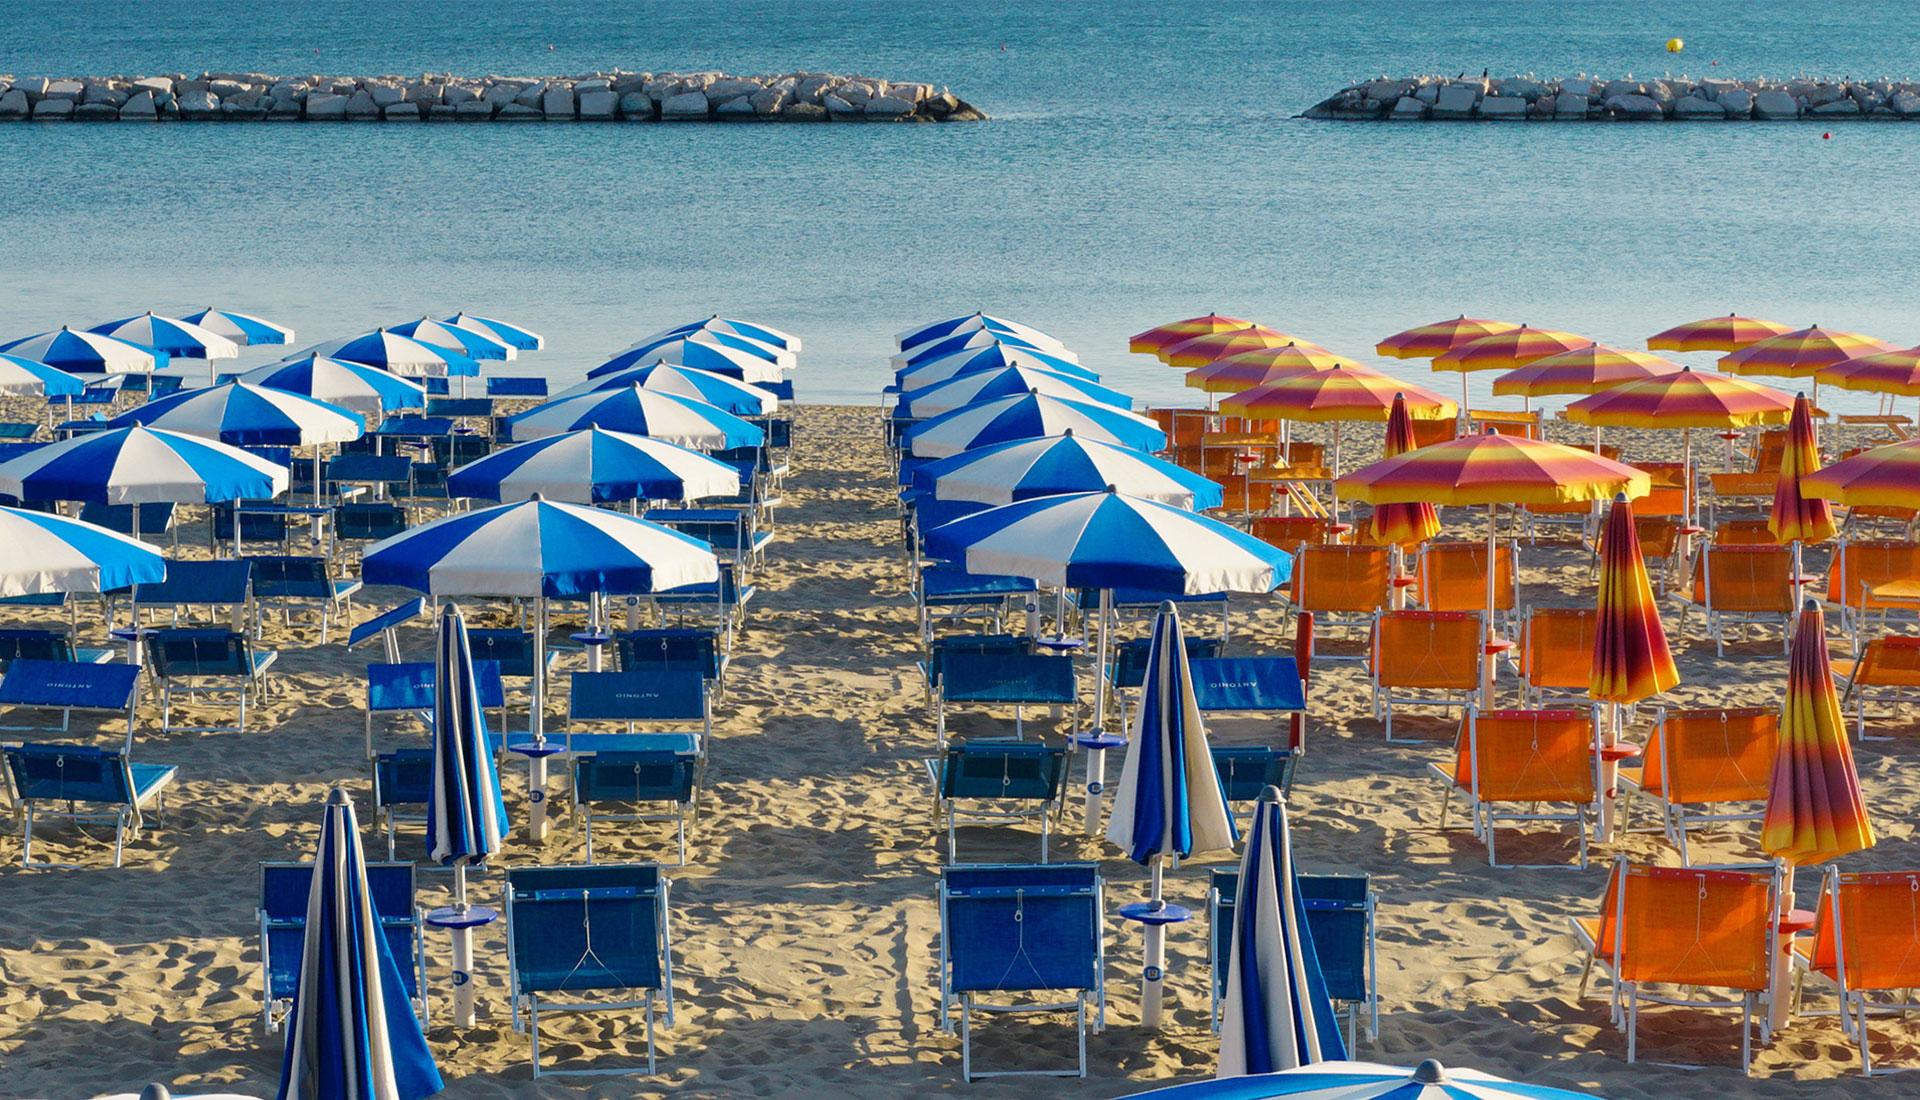 tour italy sejour cote adriatique gabicce mare